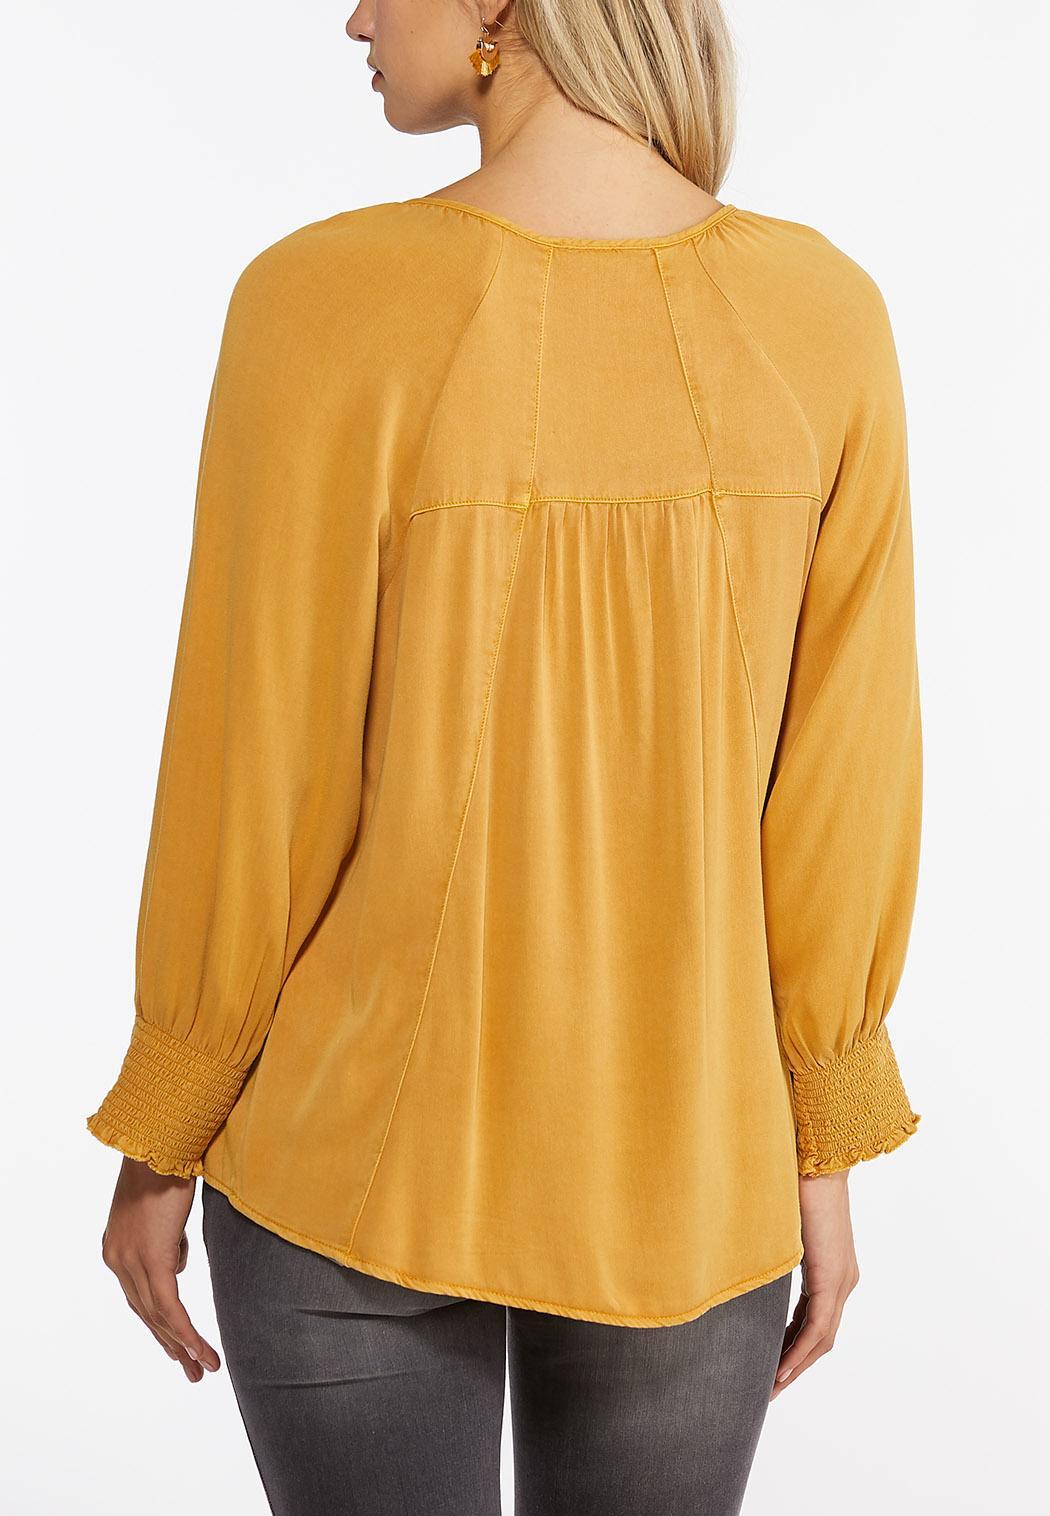 Honey Smocked Top (Item #44403964)